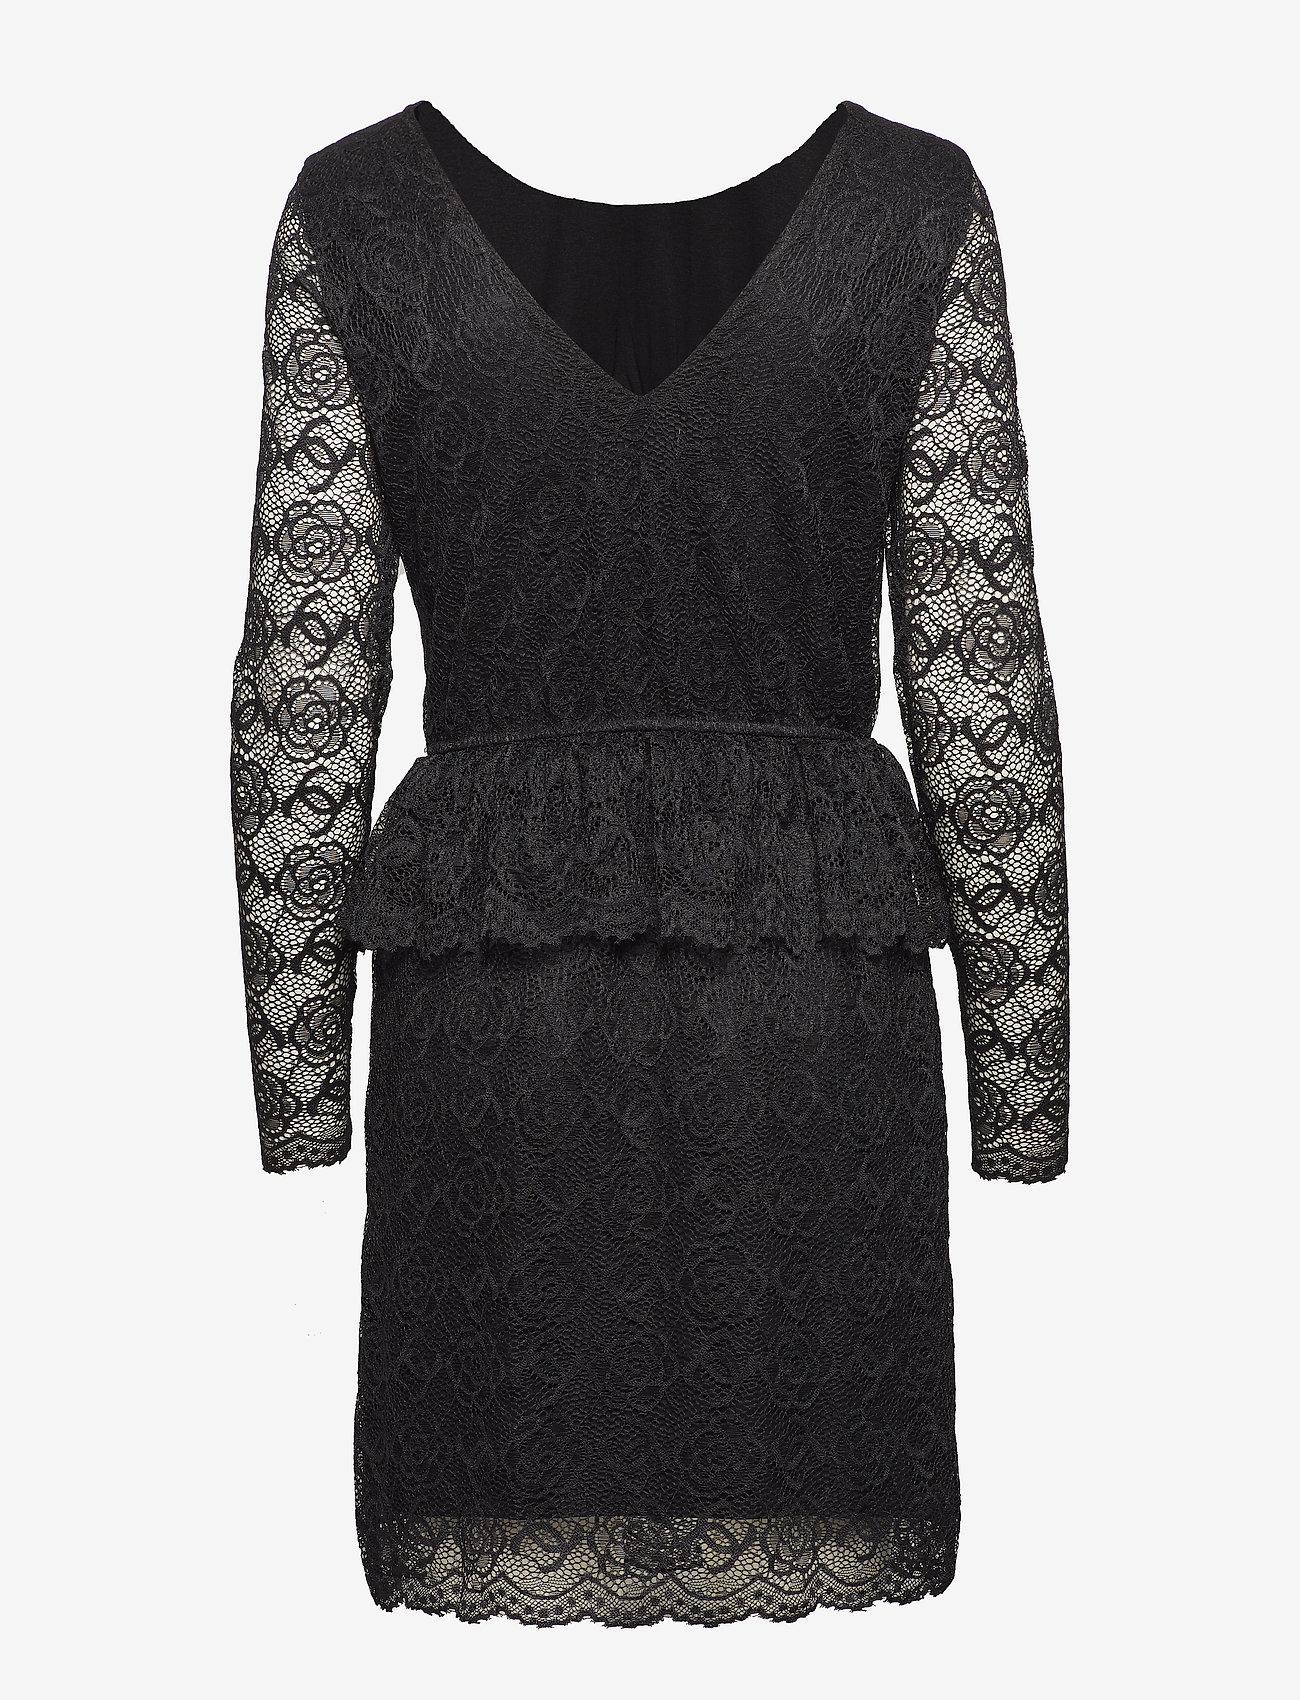 Minimum - Nikola - courtes robes - black